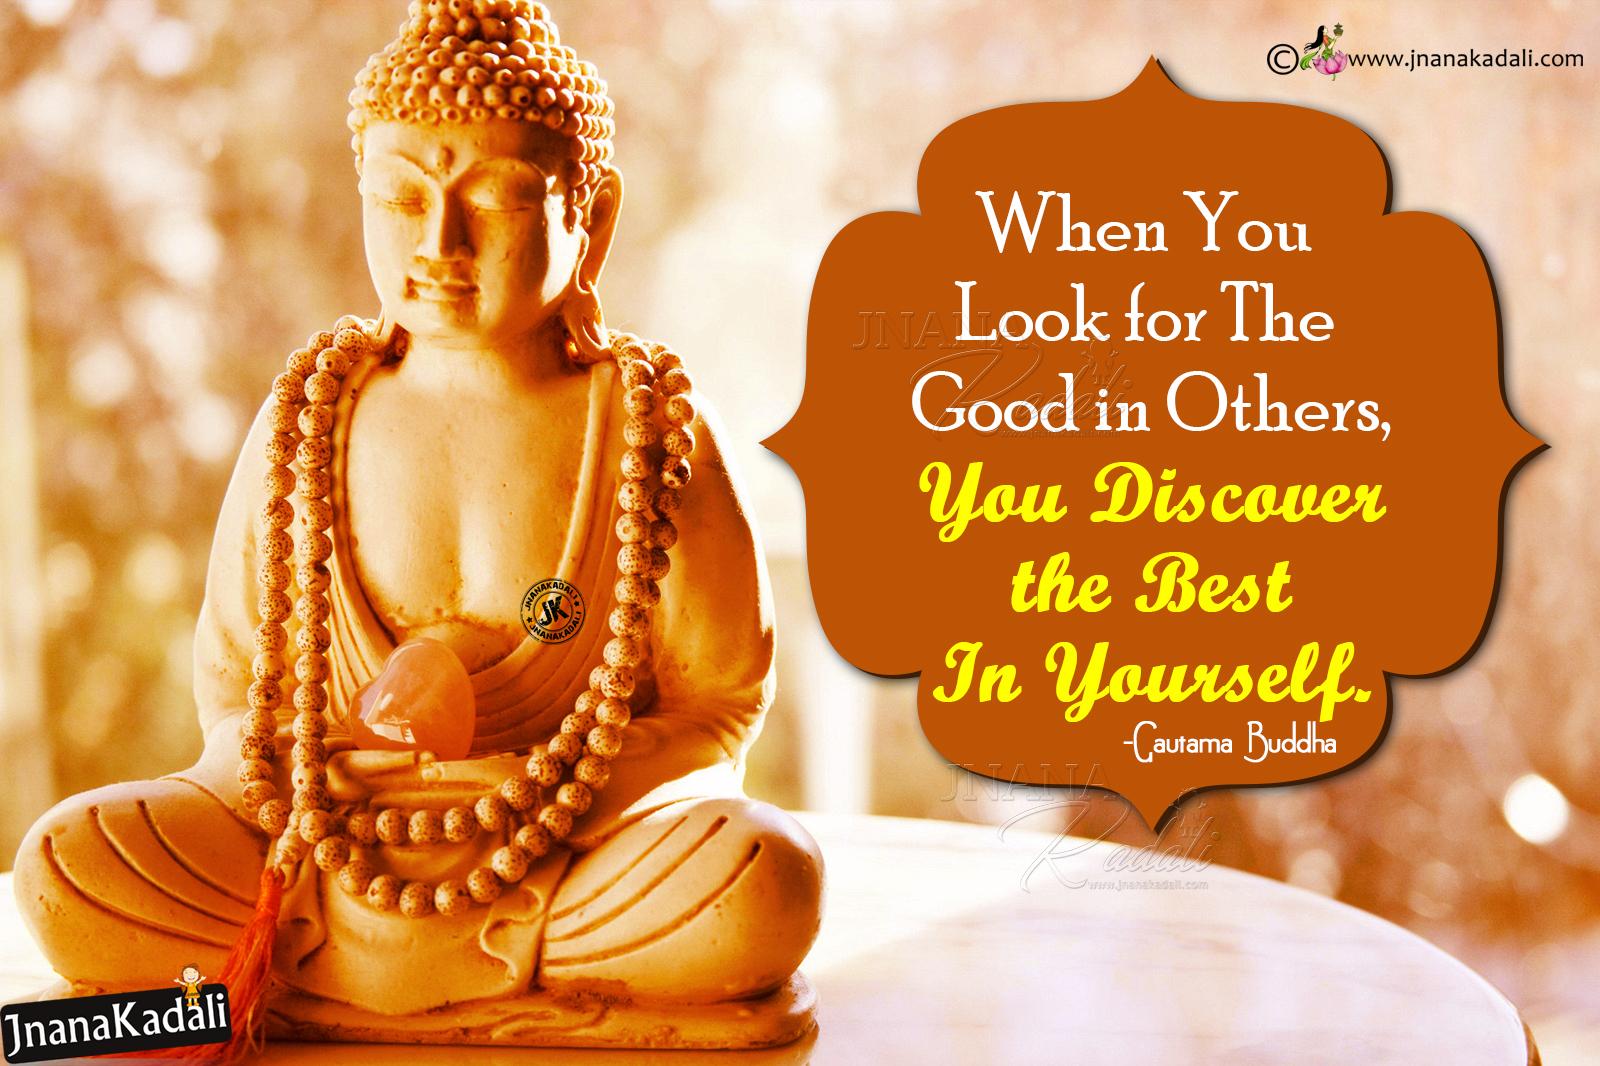 Gautama Buddha Quotes Motivational Gautama Buddha Quotes Messages In Englishdaily